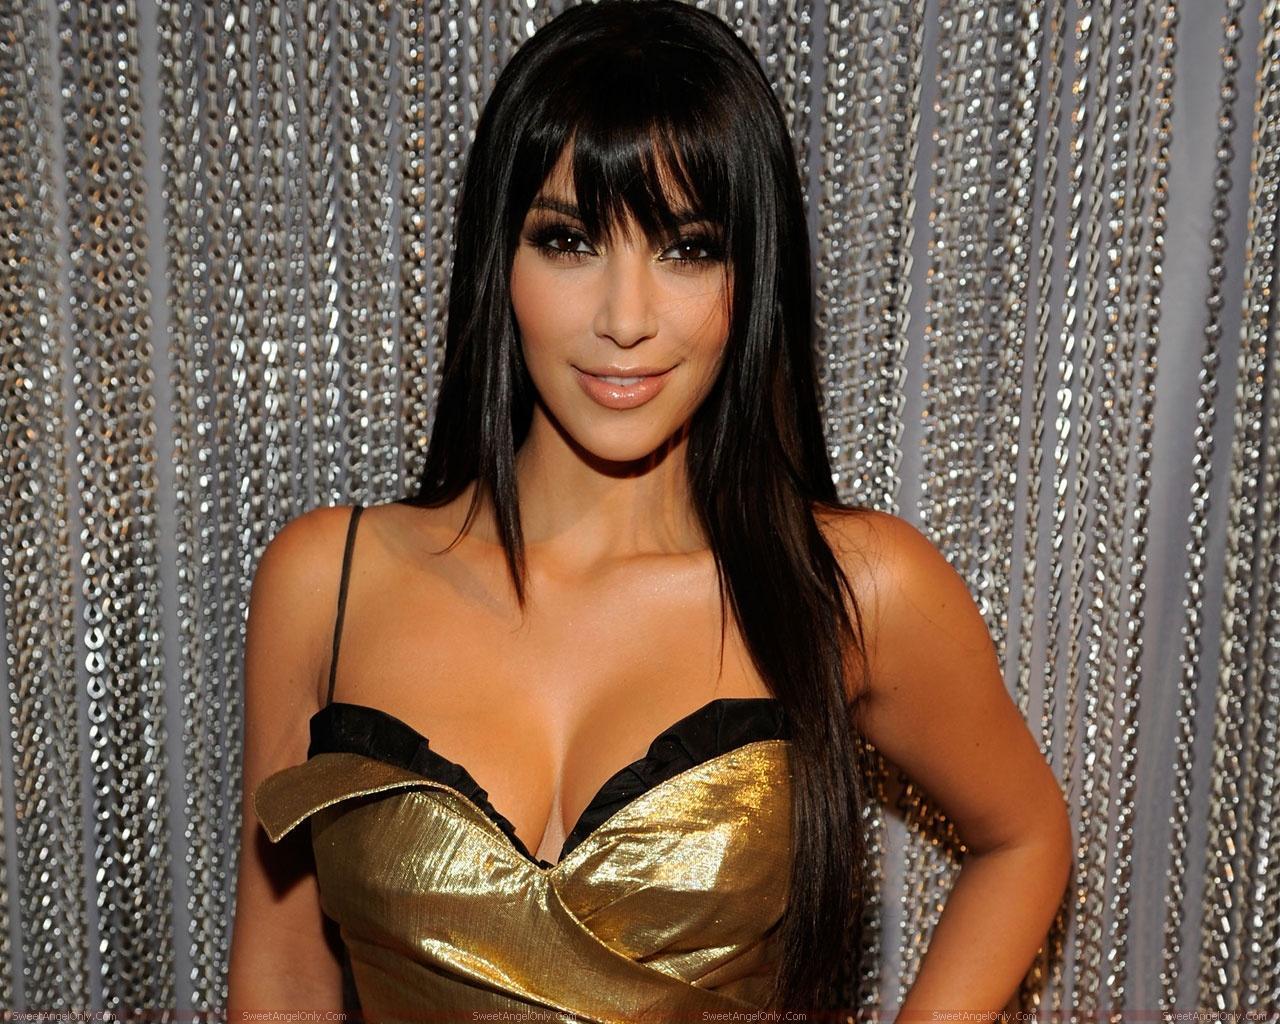 http://4.bp.blogspot.com/-cs65niZmIyM/TXtN-X-1yII/AAAAAAAAFdc/aCBnZ3pEWDA/s1600/actress_kim_kardashian_hot_wallpaper_sweetangelonly_41.jpg